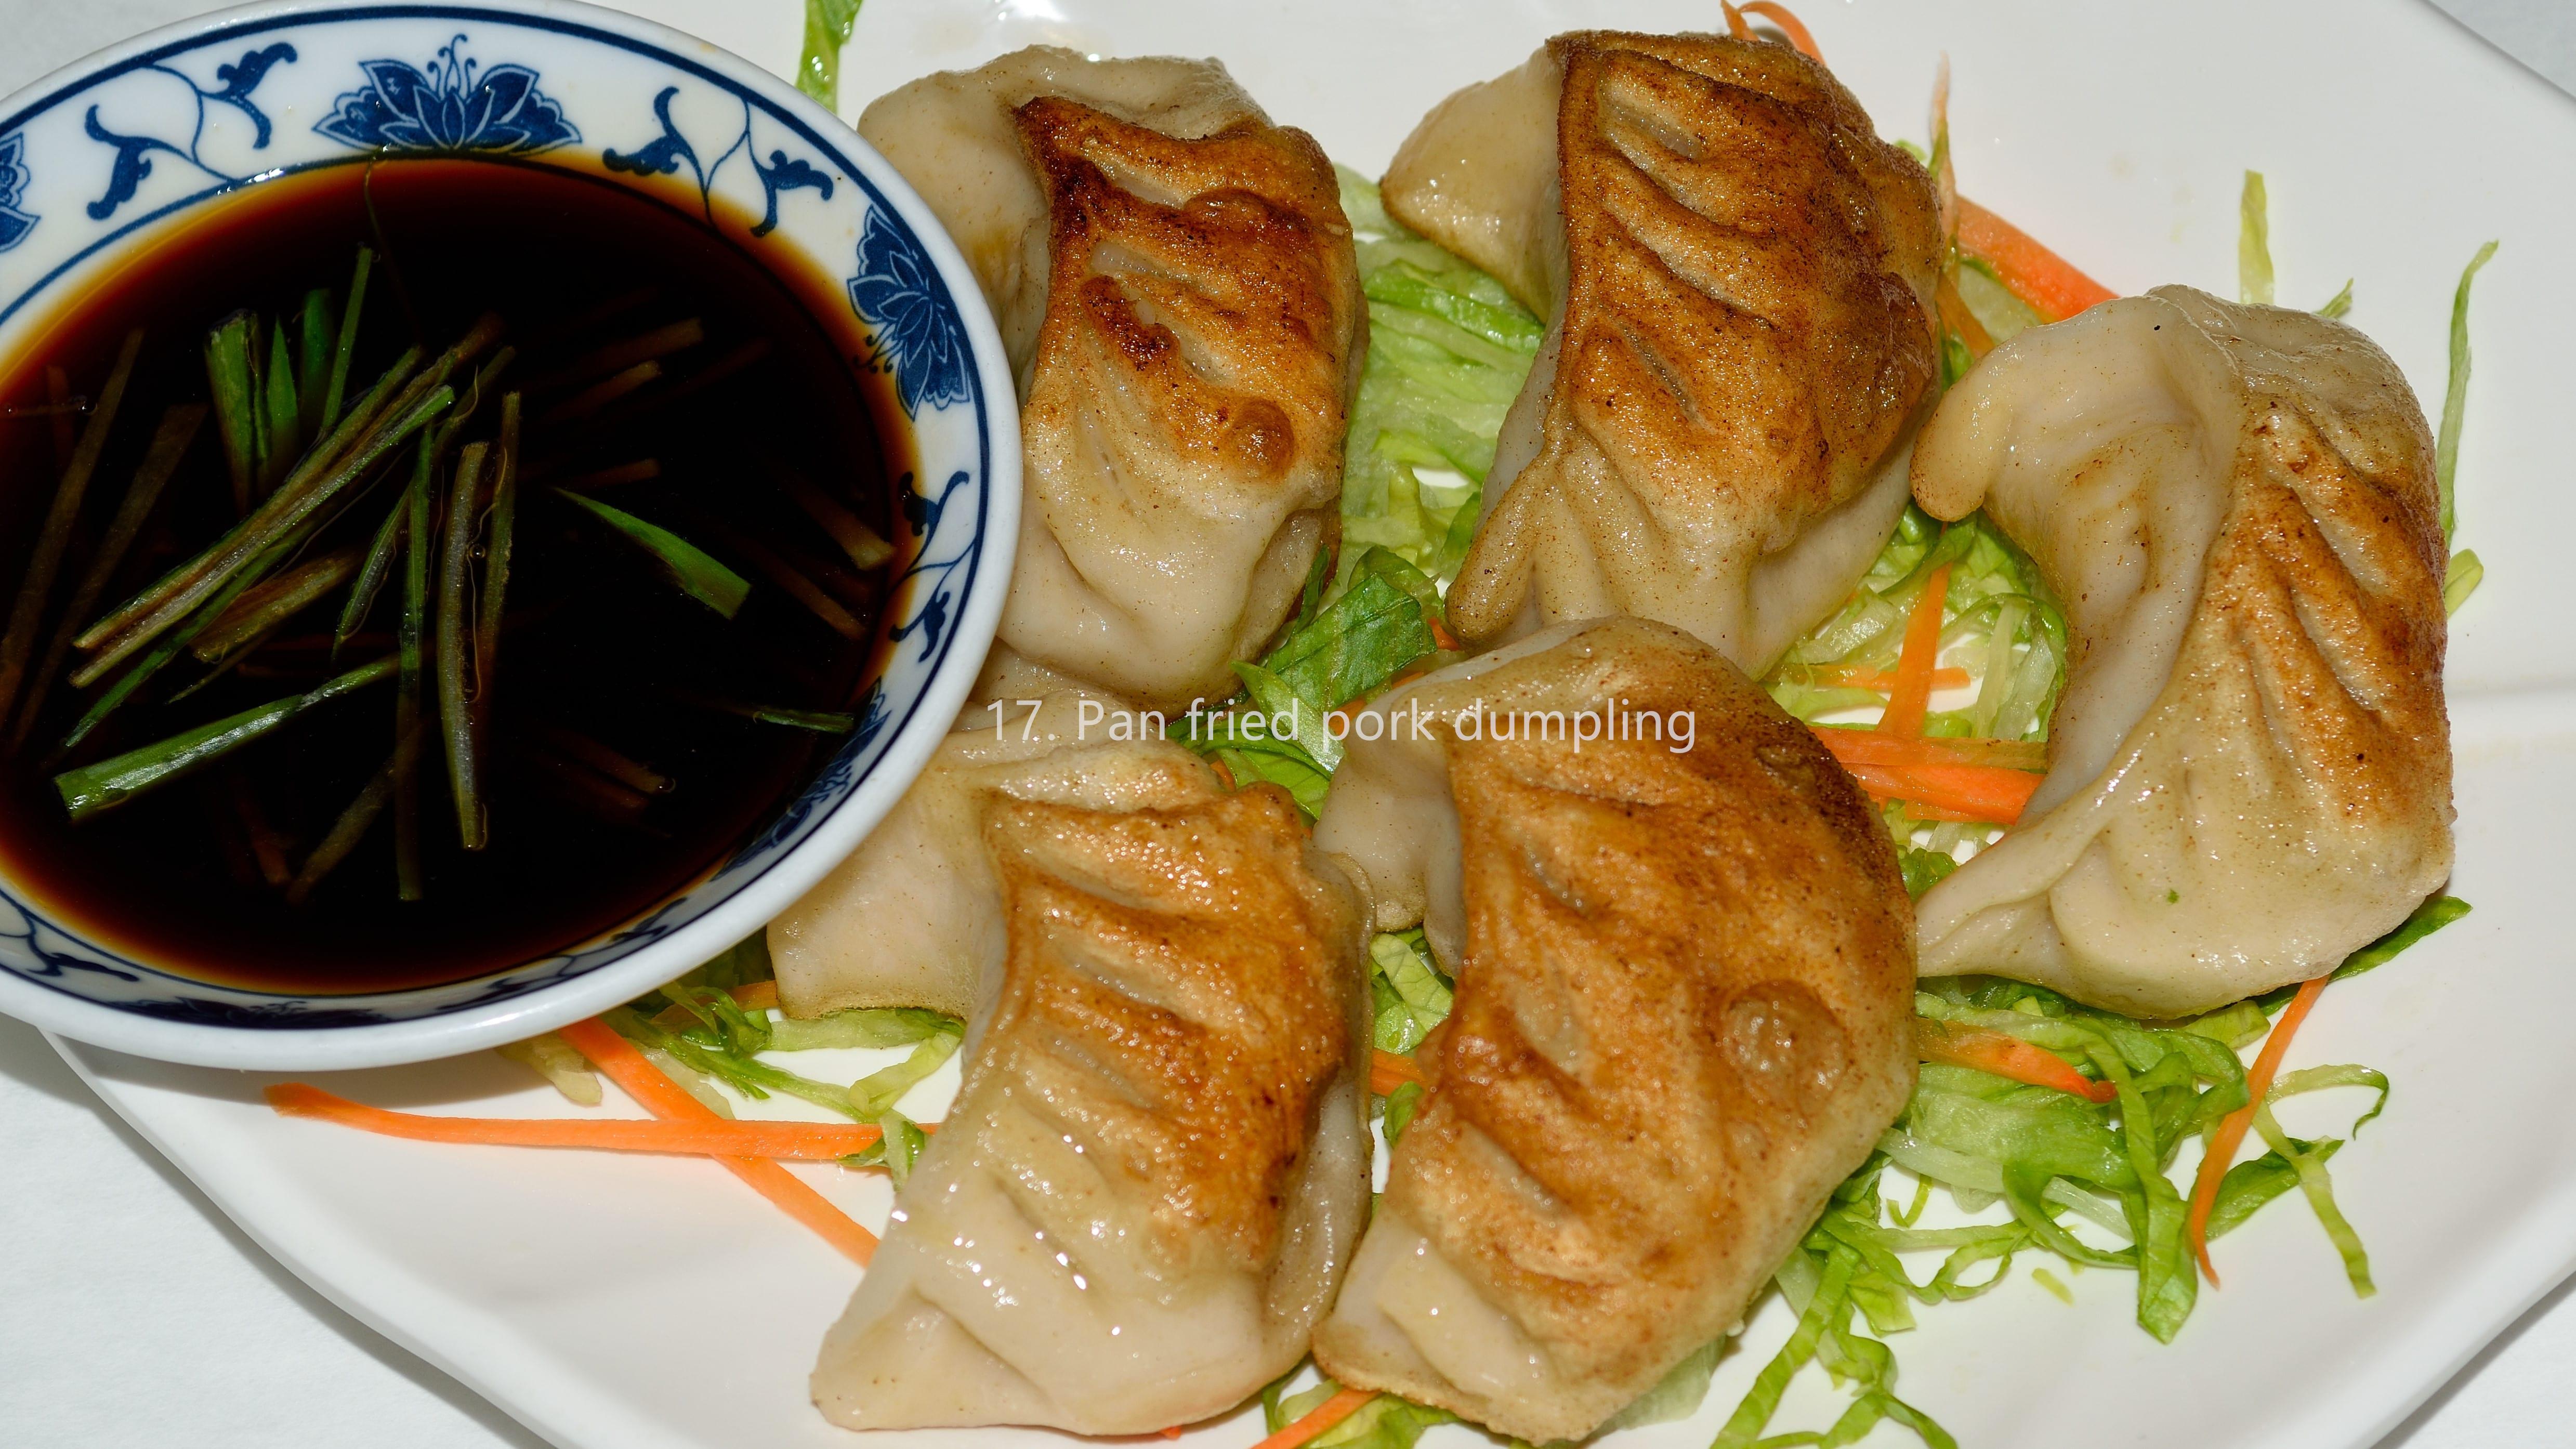 Pan fried pork dumpling